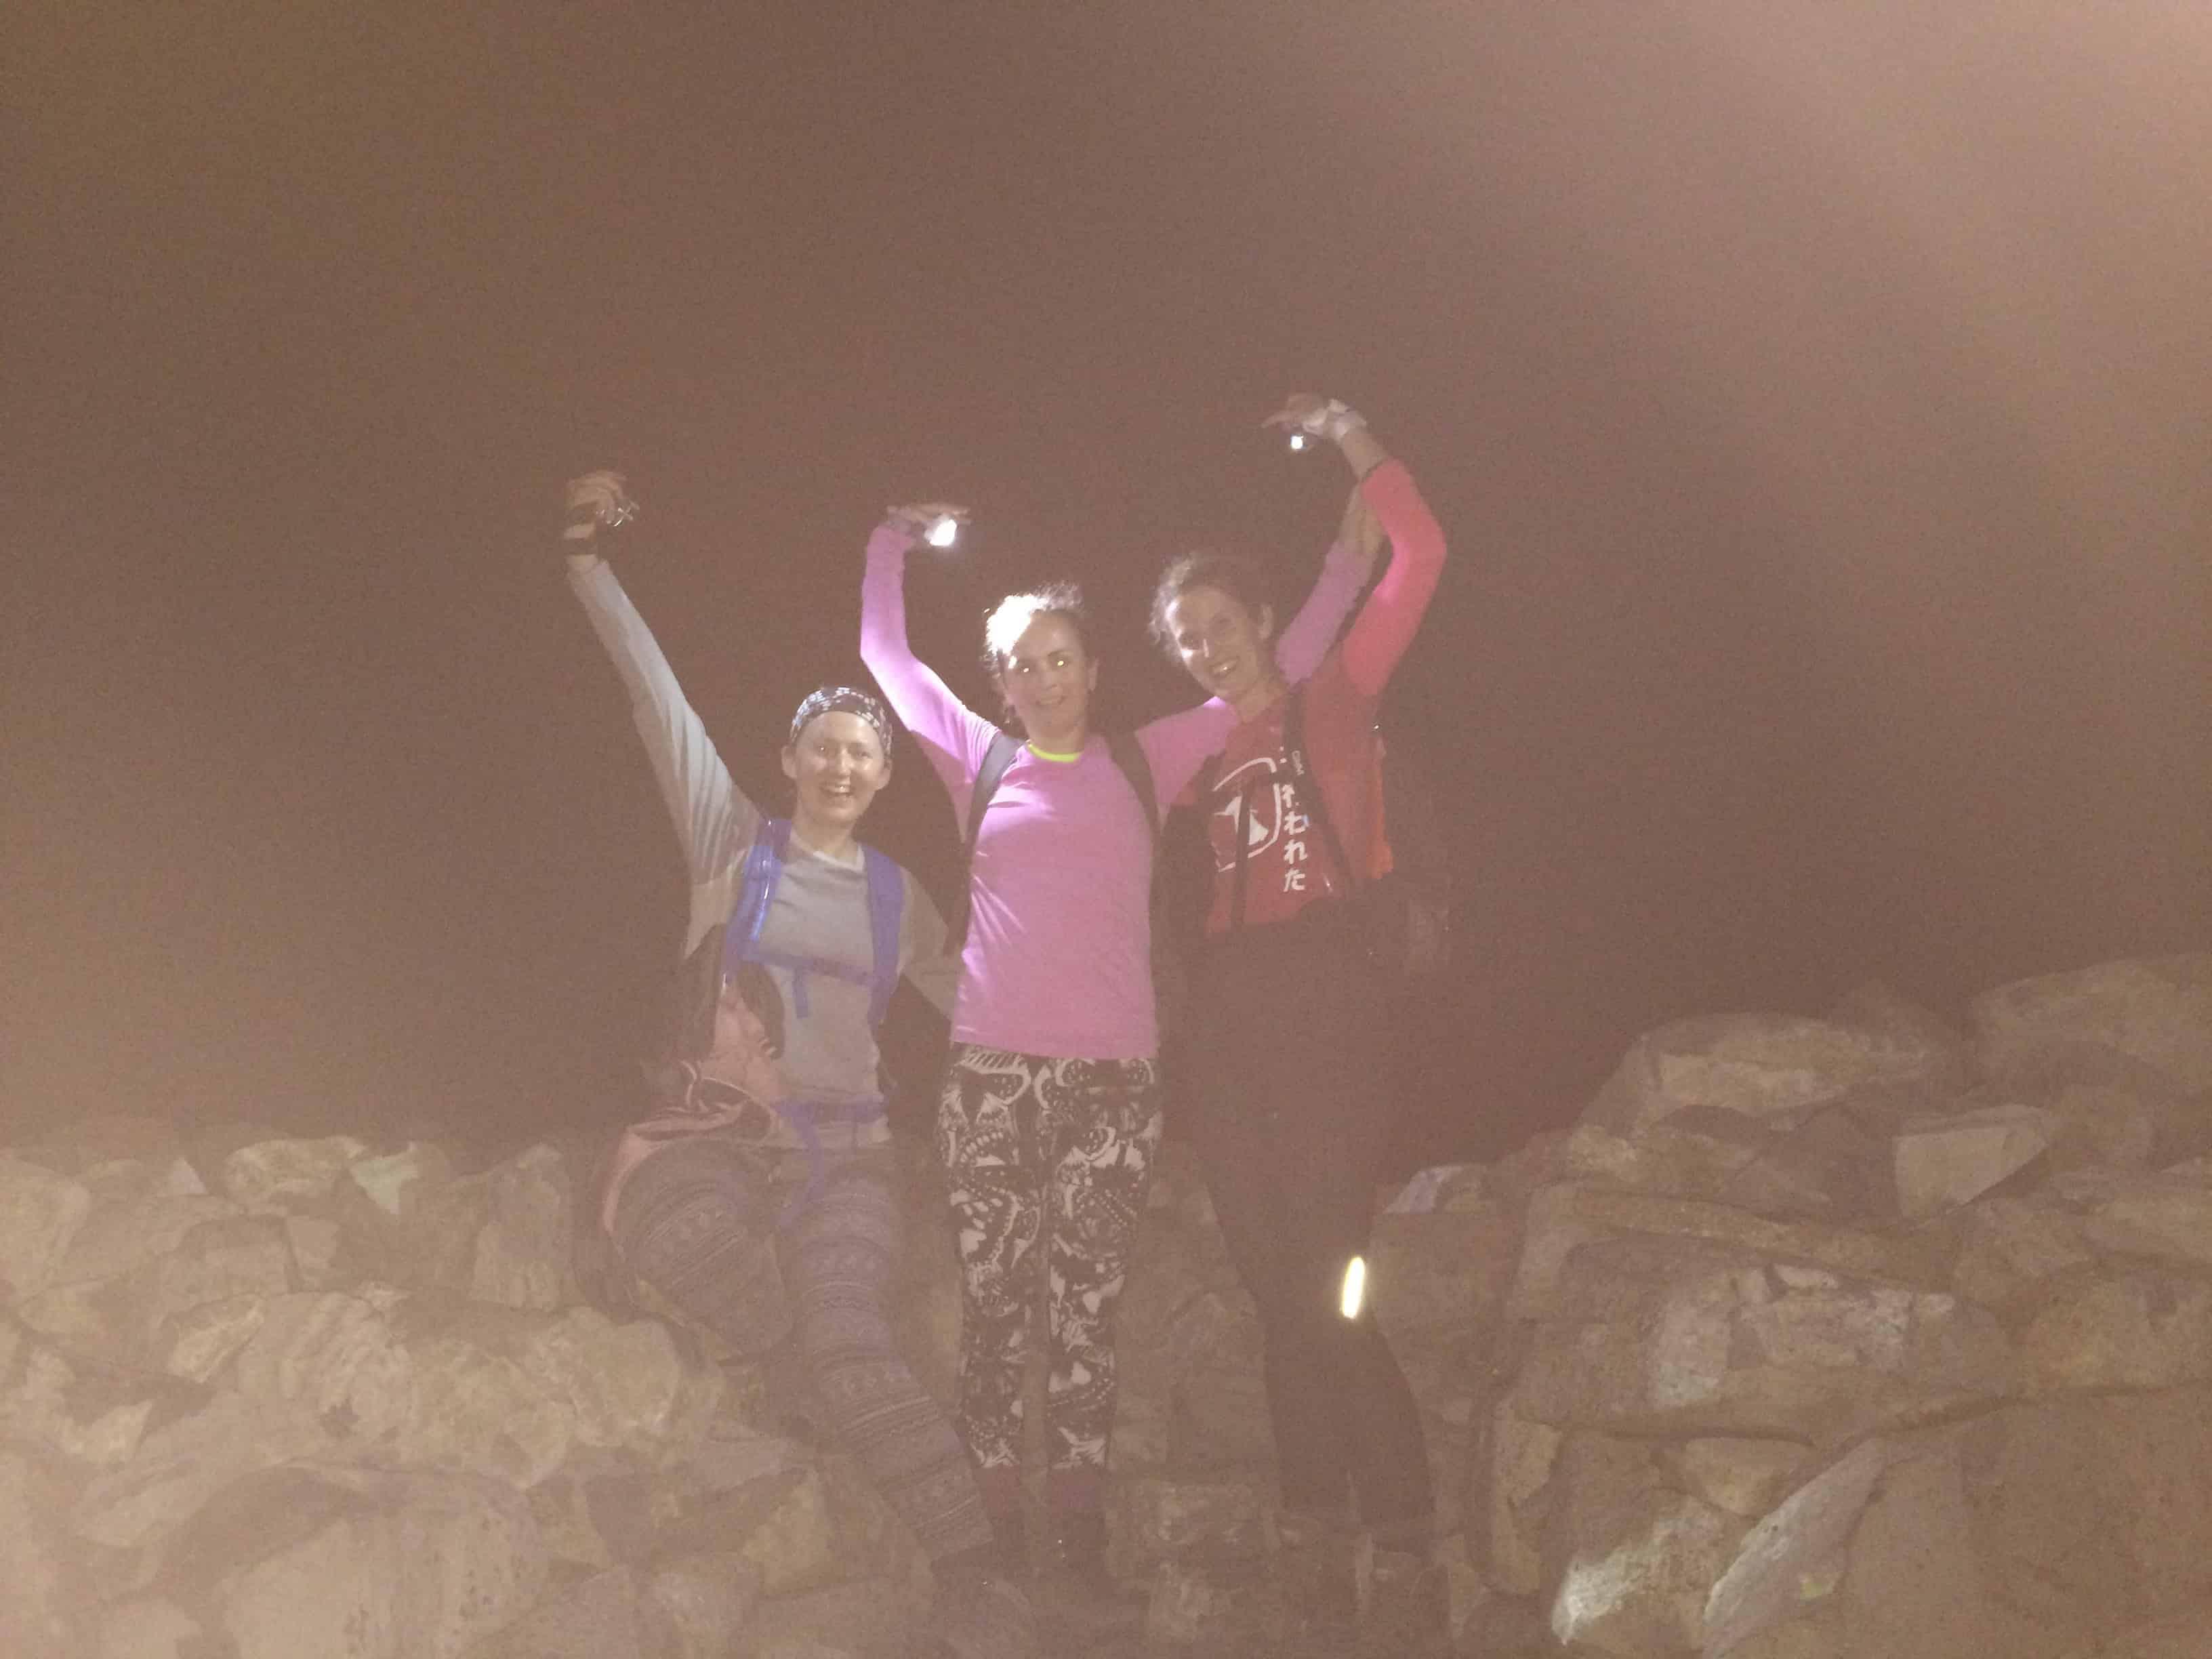 Completing the UK 3 Peaks challenge